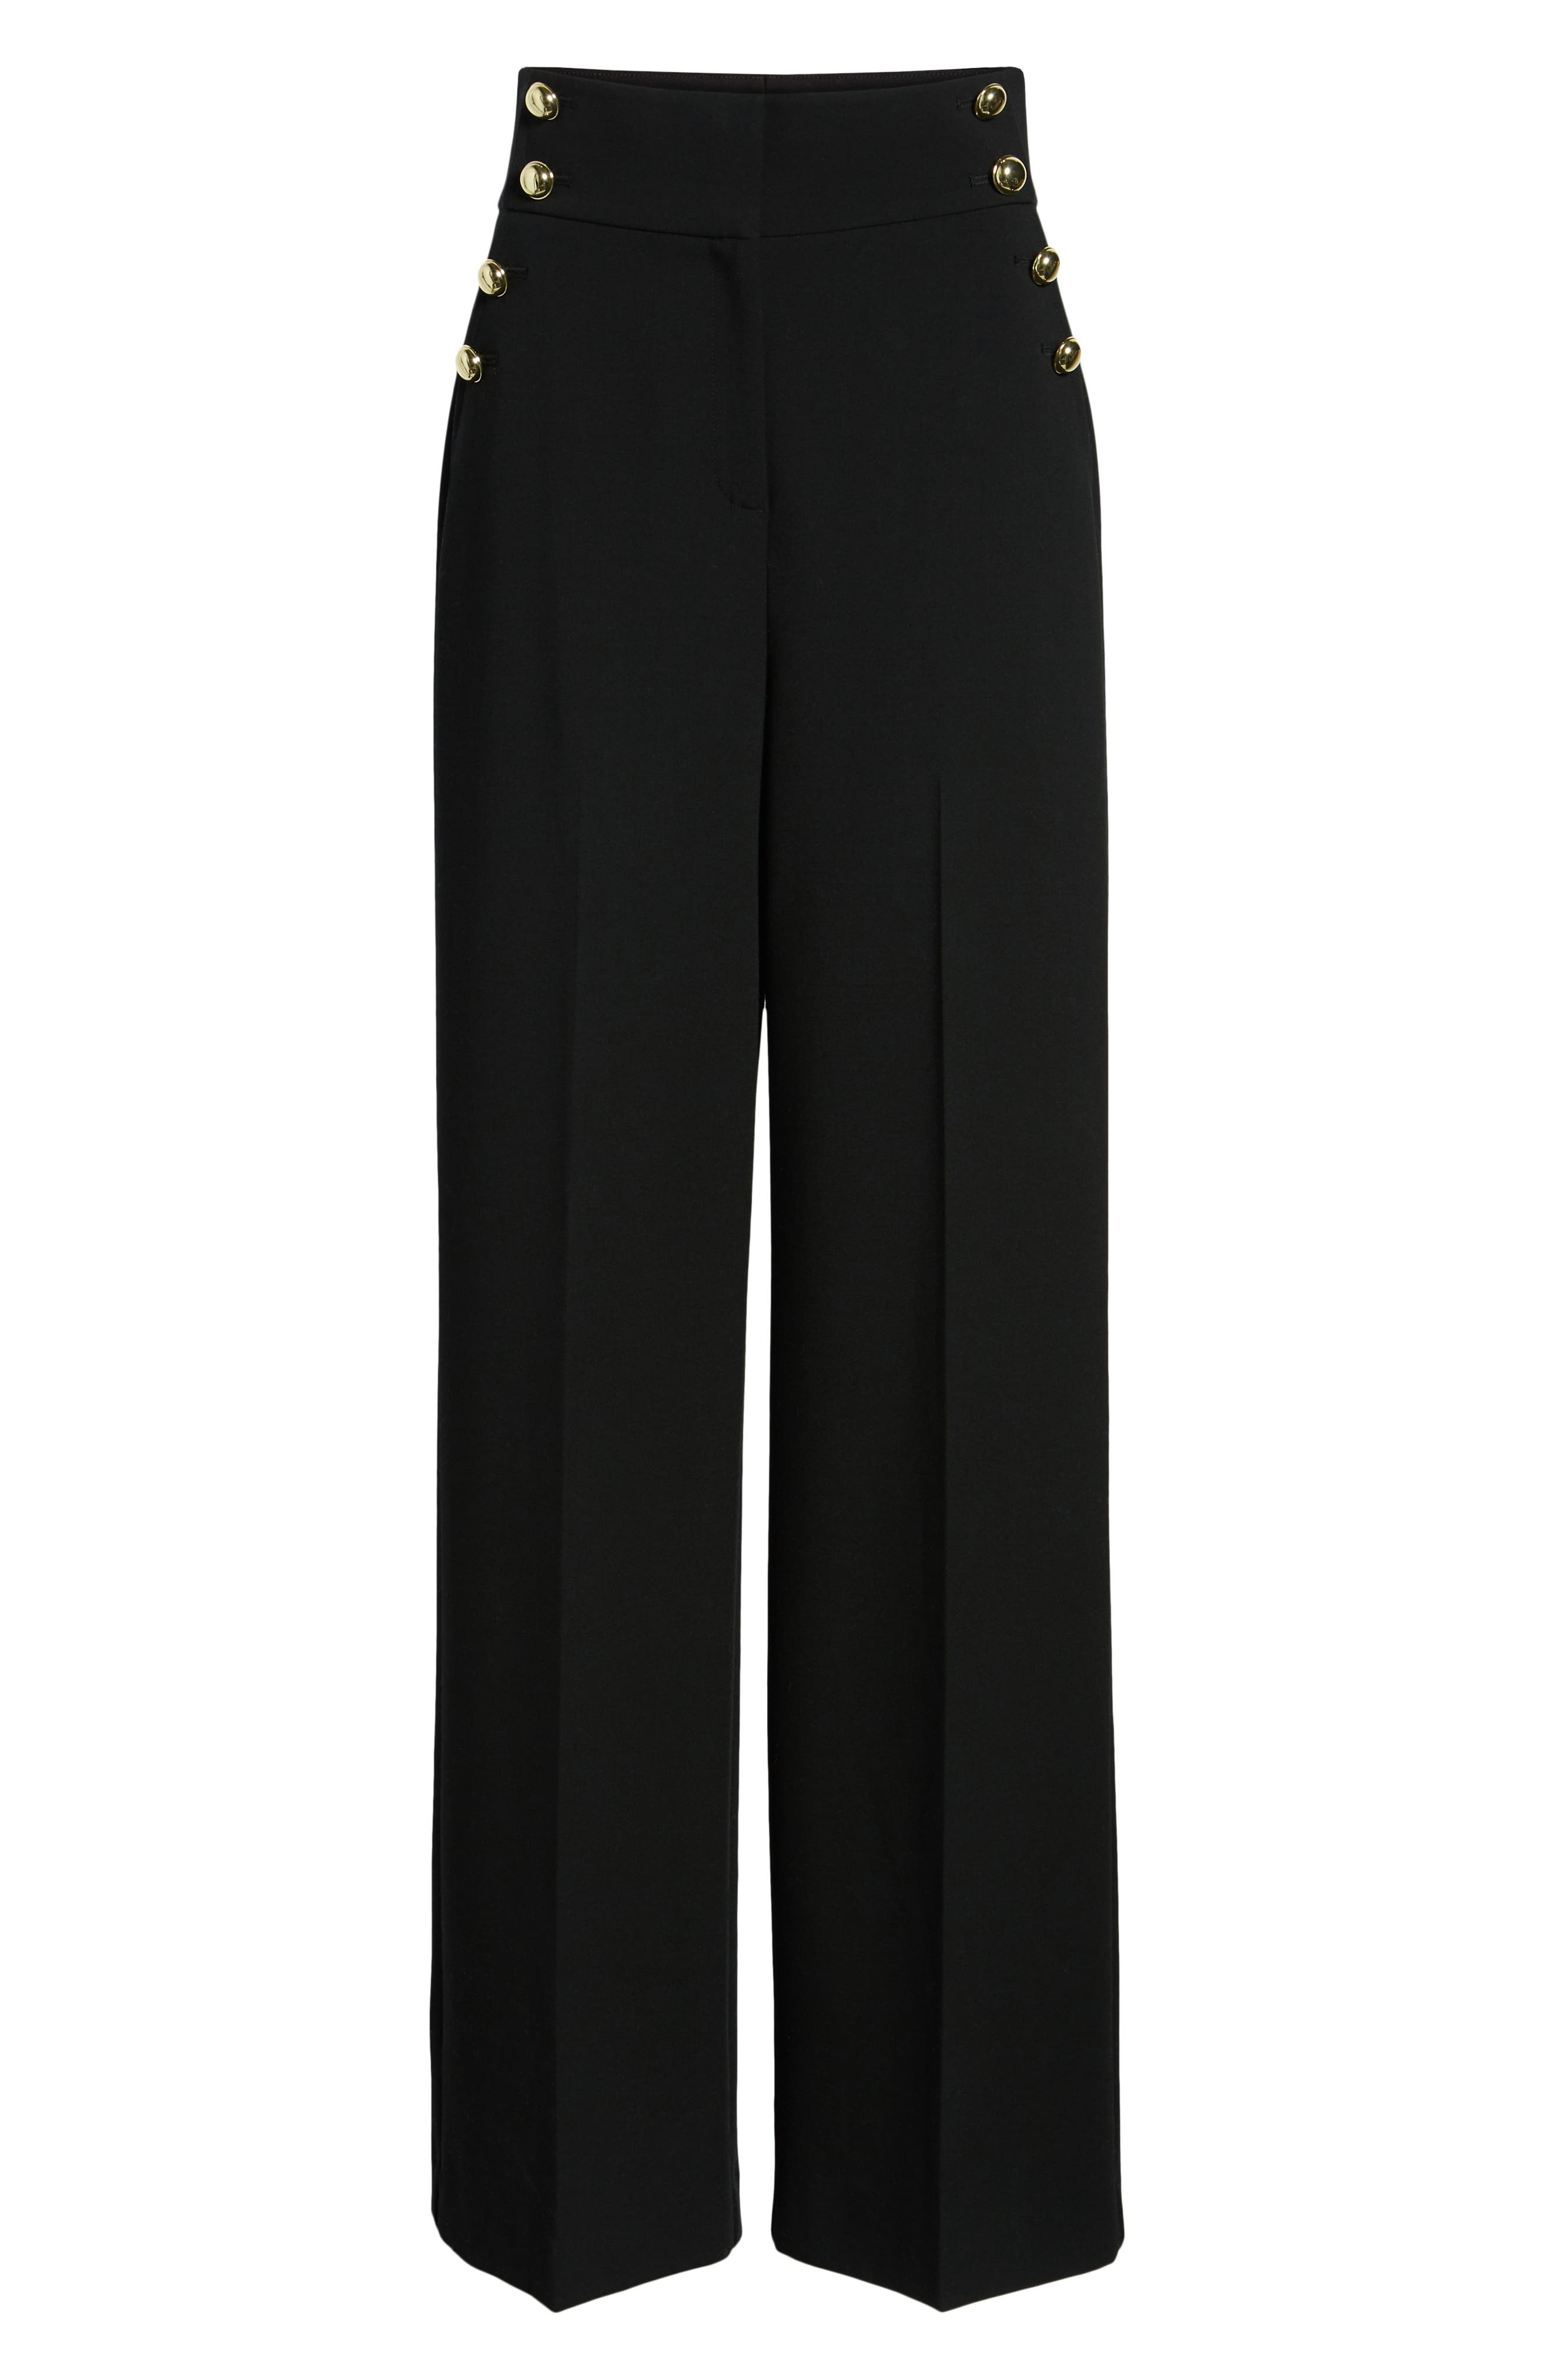 x Atlantic-Pacific High Waist Wide Leg Pants,                             Alternate thumbnail 7, color,                             BLACK